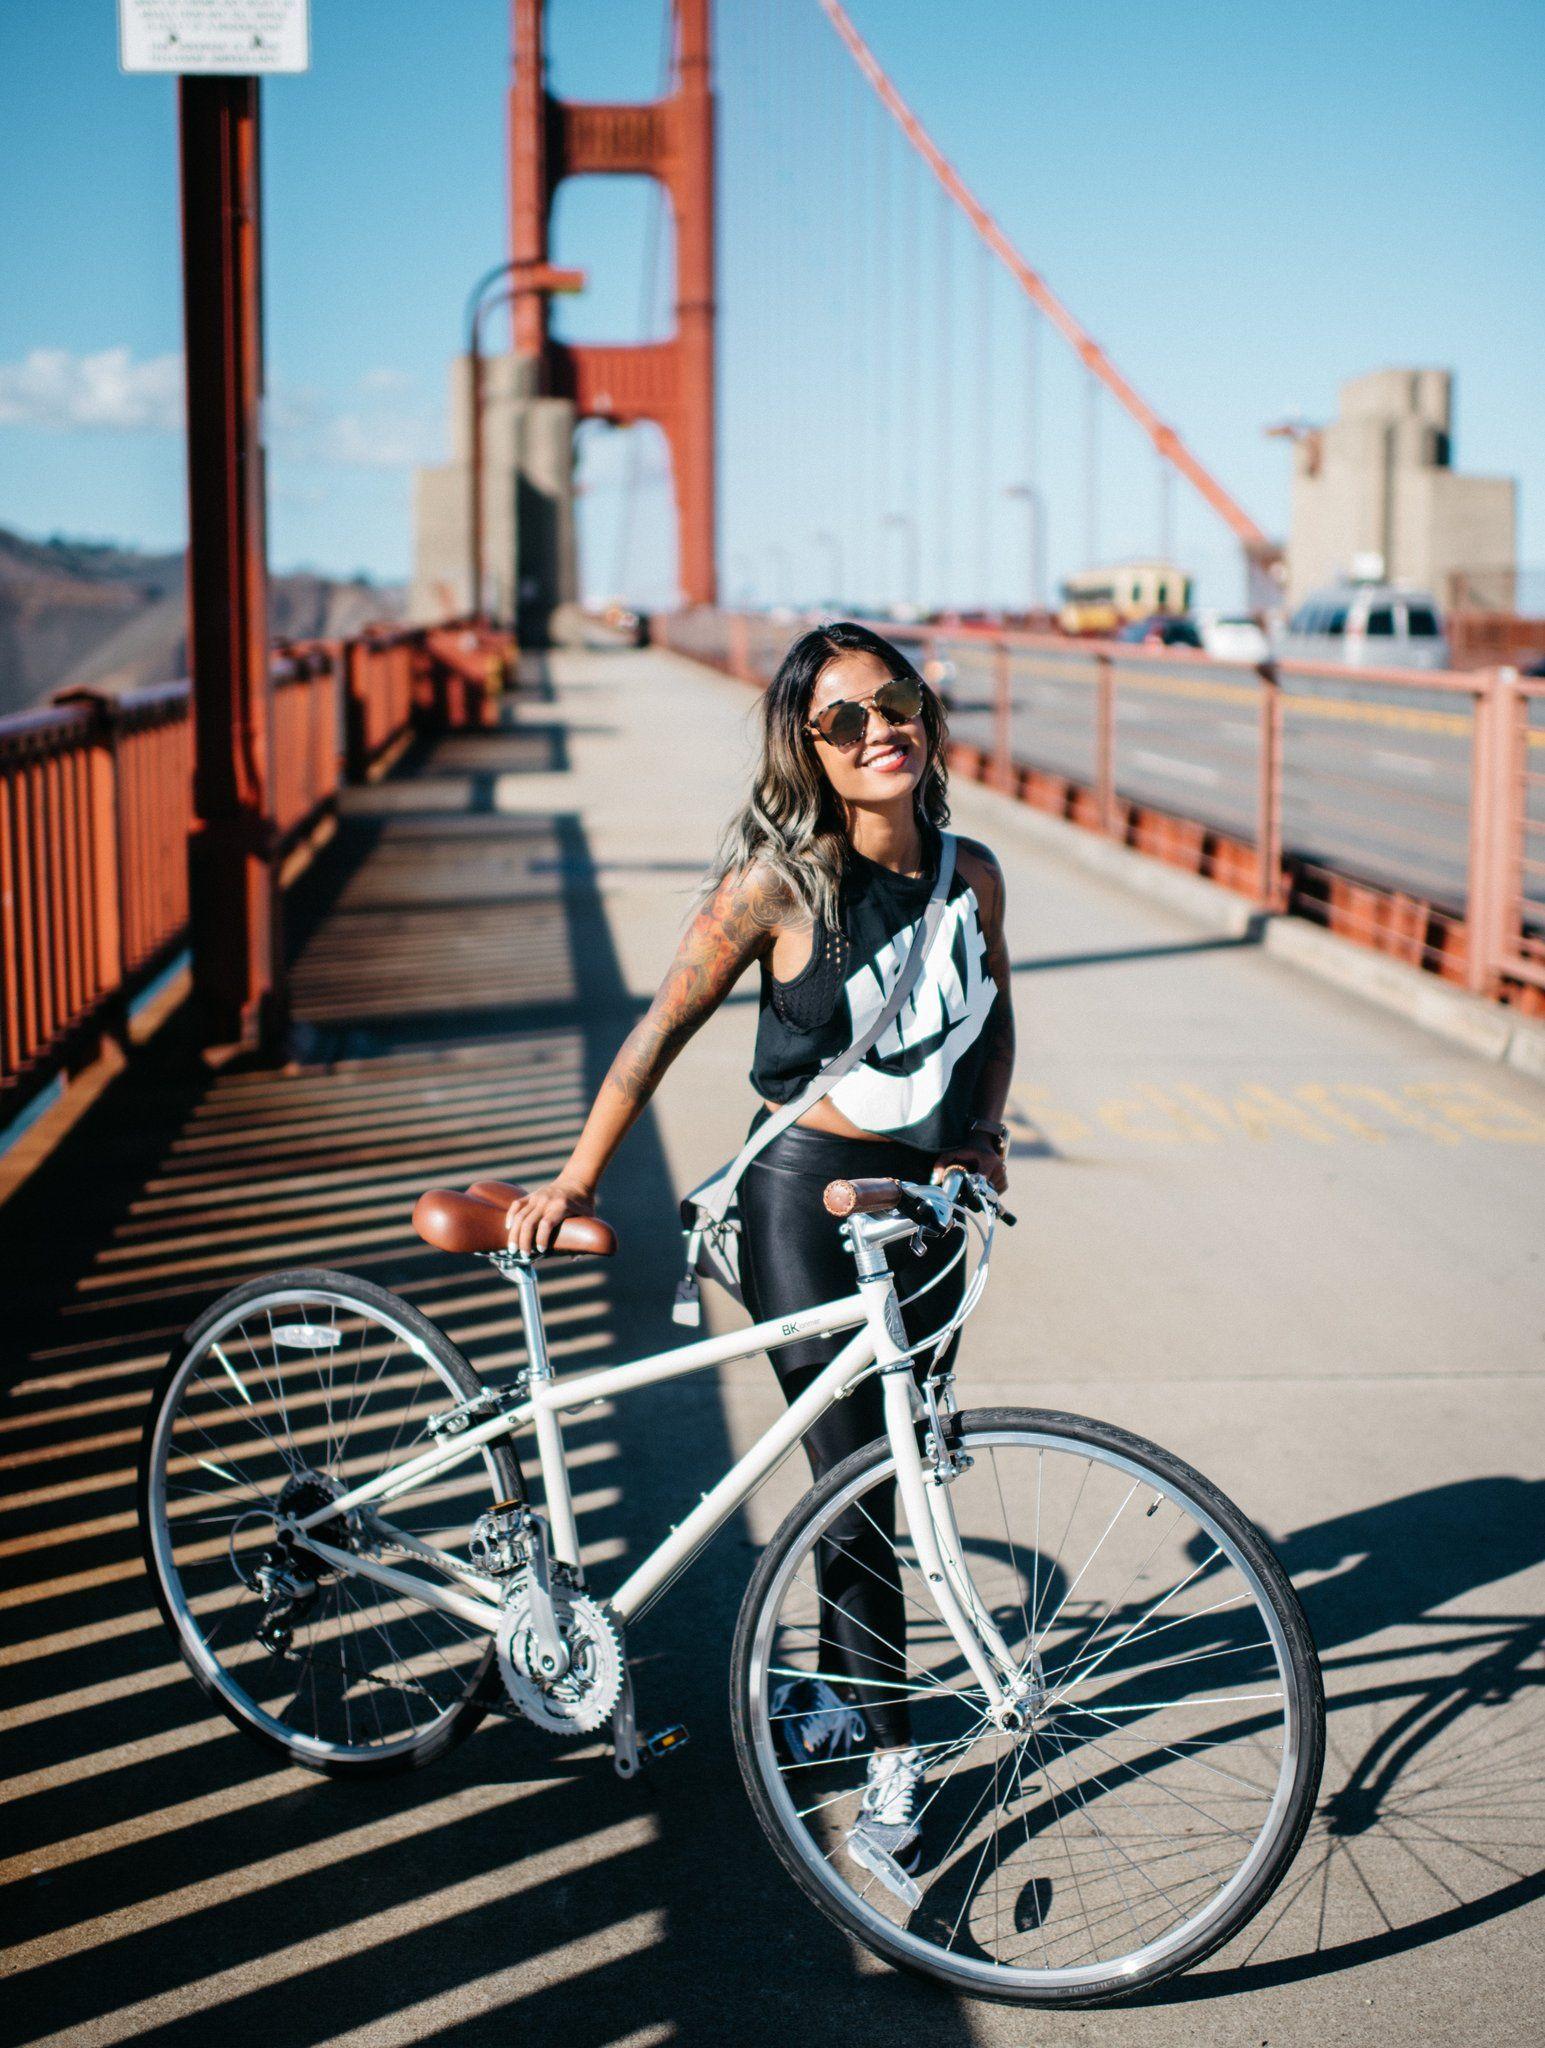 City Bicycle Tour 11 Spots To Explore In San Fran Bike Tour